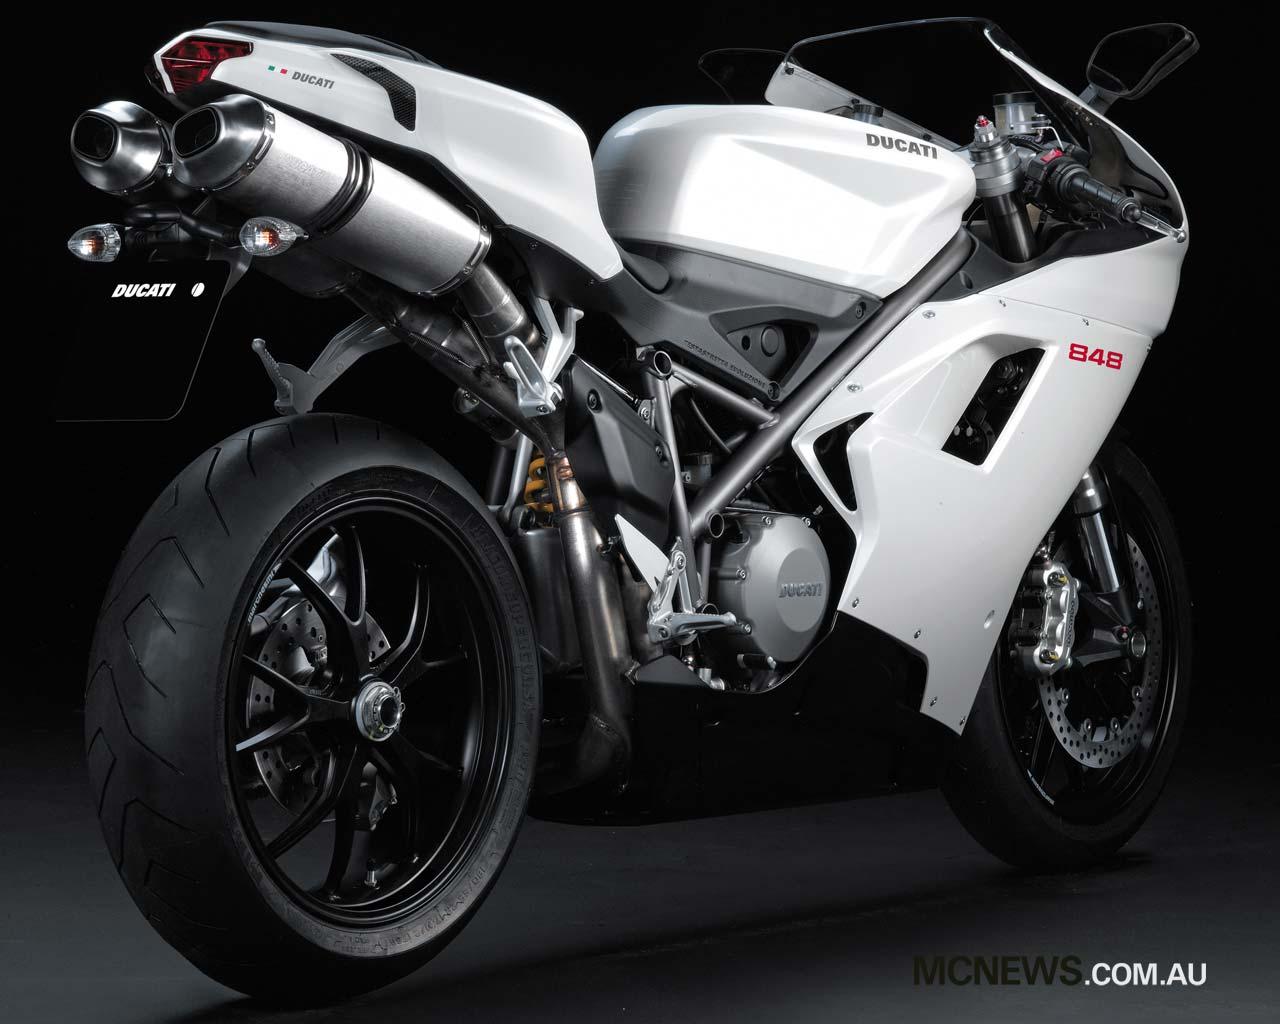 Ducati Motorcycle Wallpaper 7140 Hd Wallpapers in Bikes   Imagescicom 1280x1024